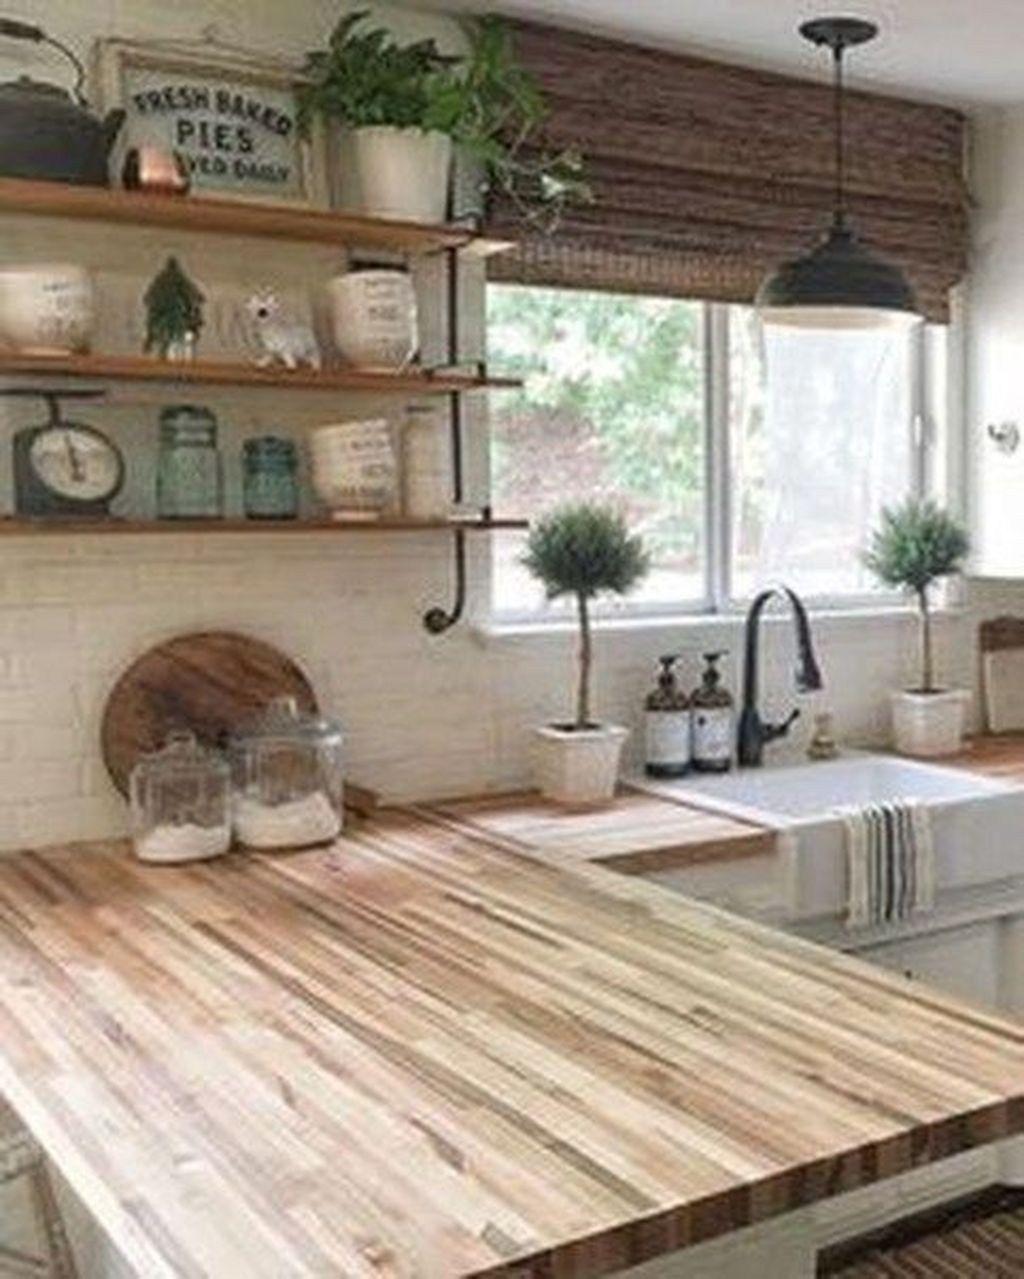 30+ Creative Farmhouse Kitchen Design Ideas #farmhousekitchencountertops